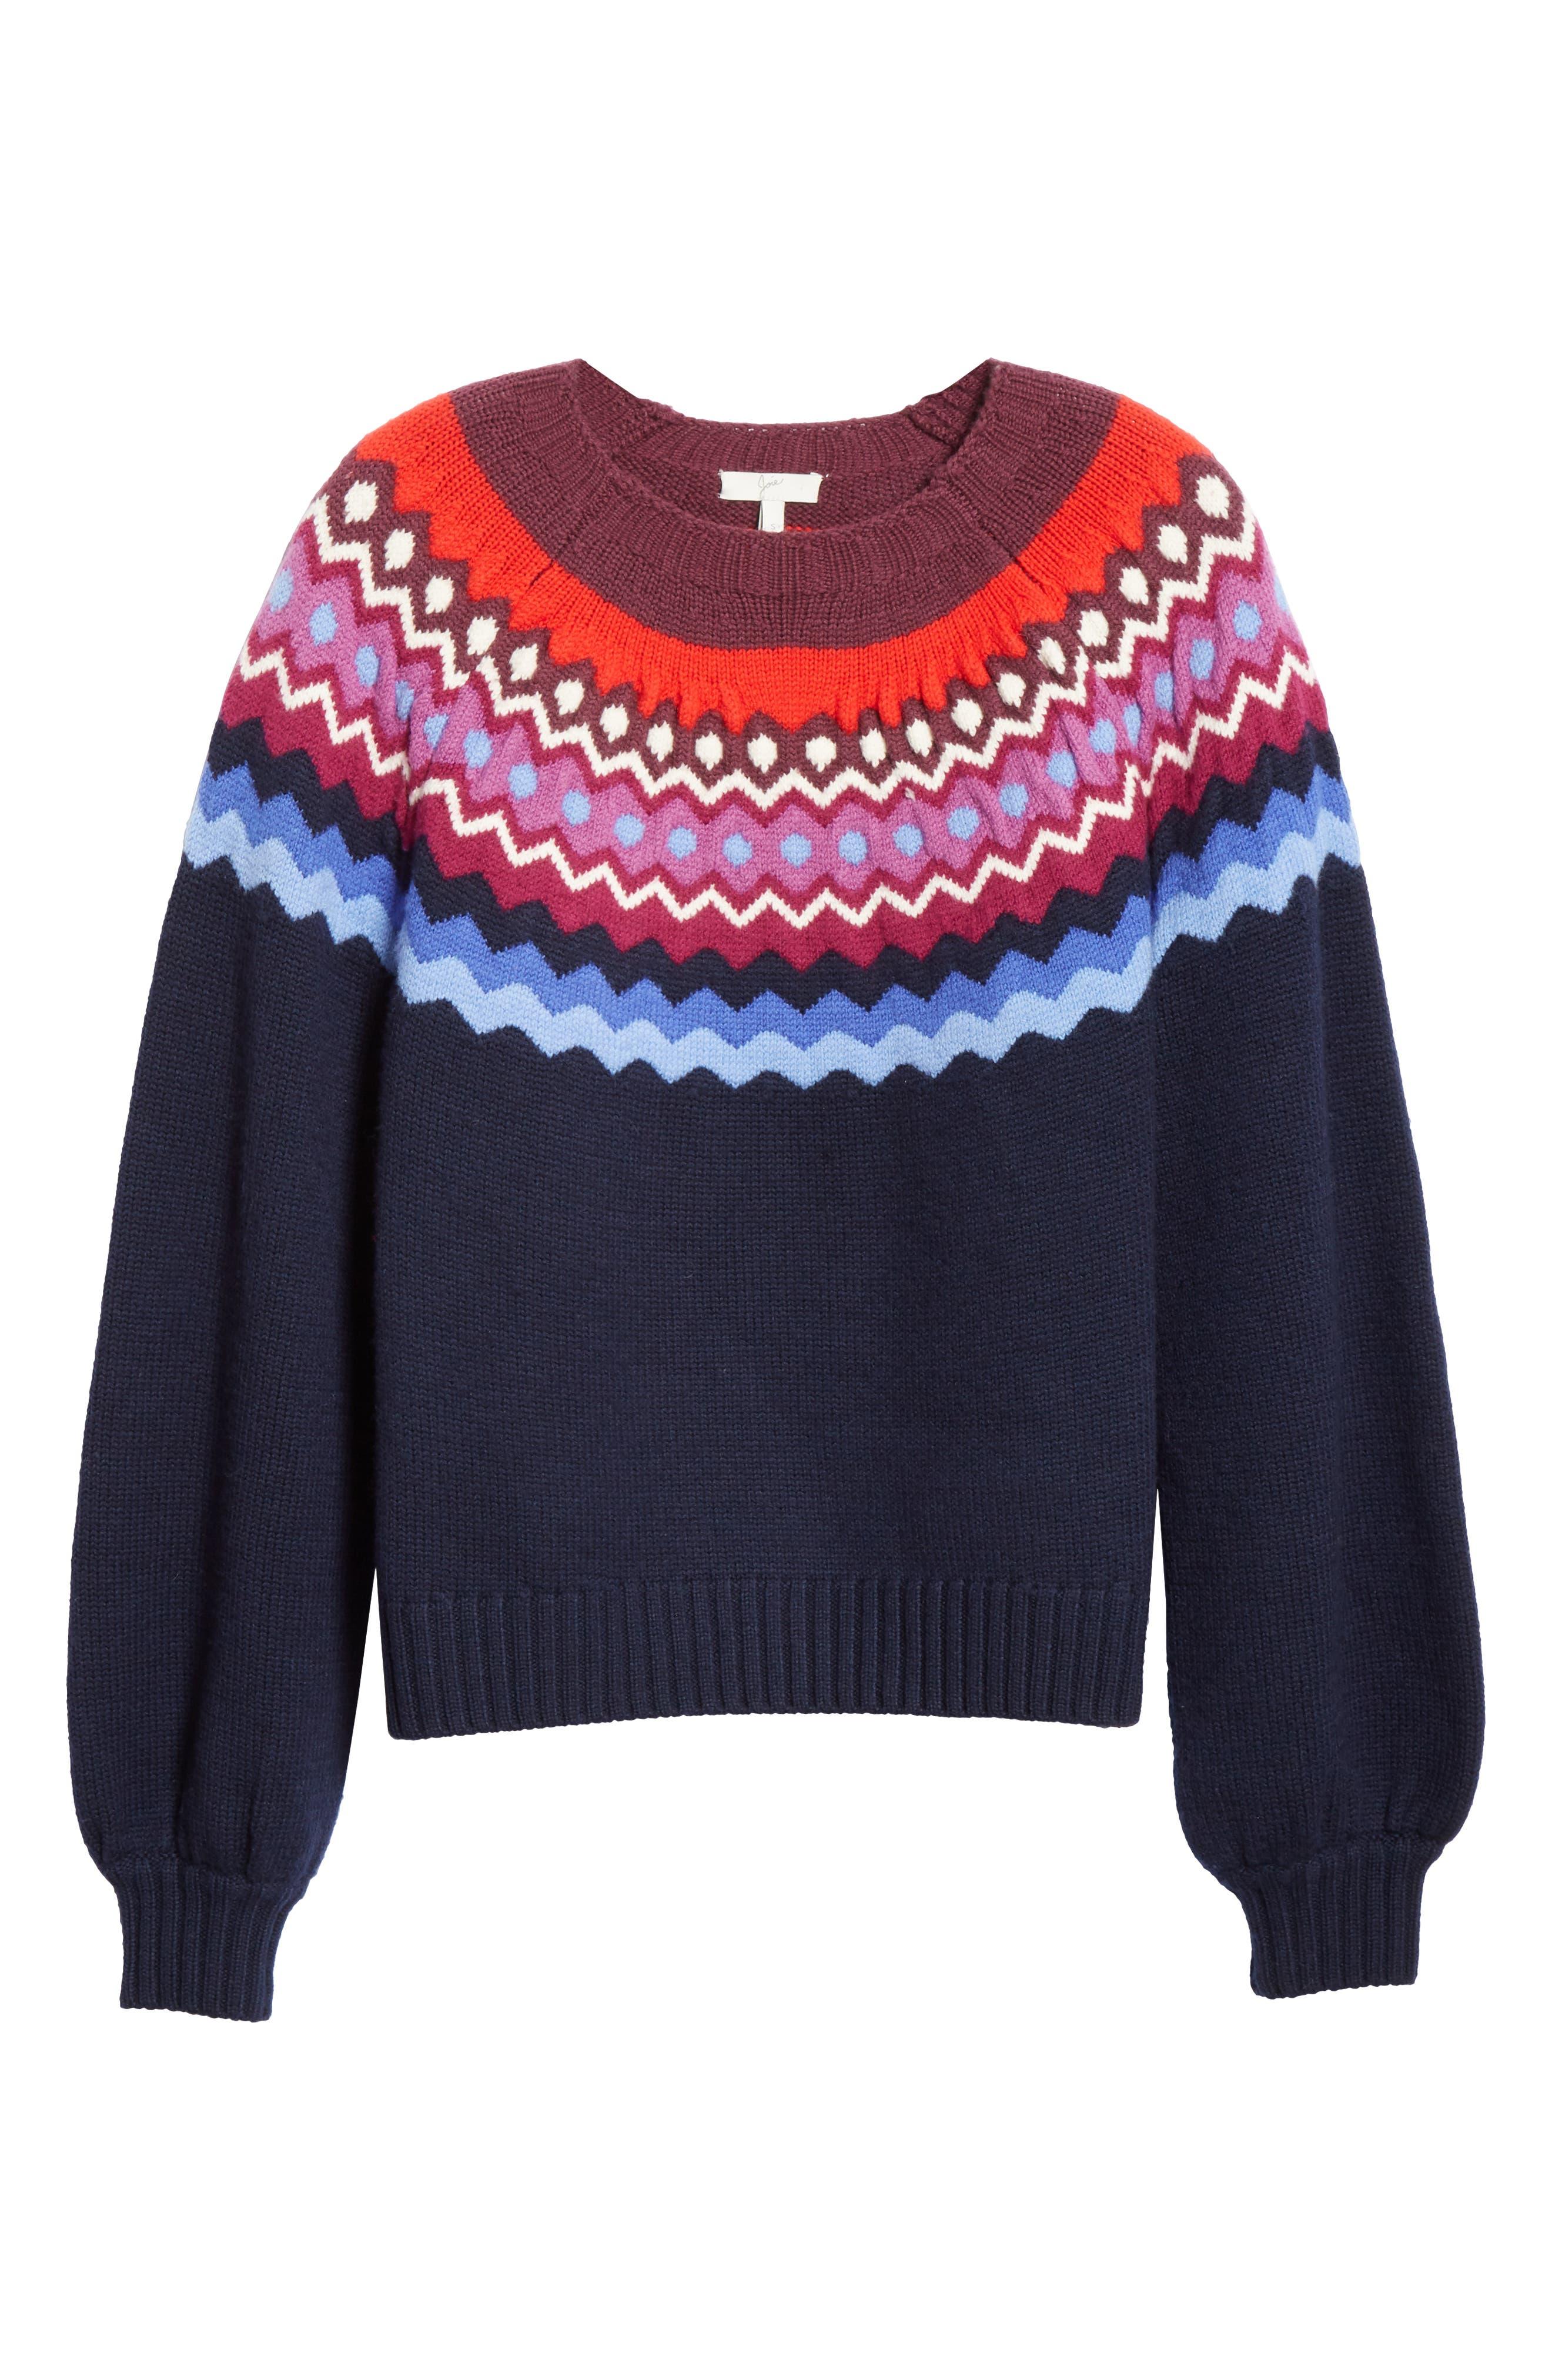 JOIE,                             Karenya Sweater,                             Alternate thumbnail 6, color,                             410